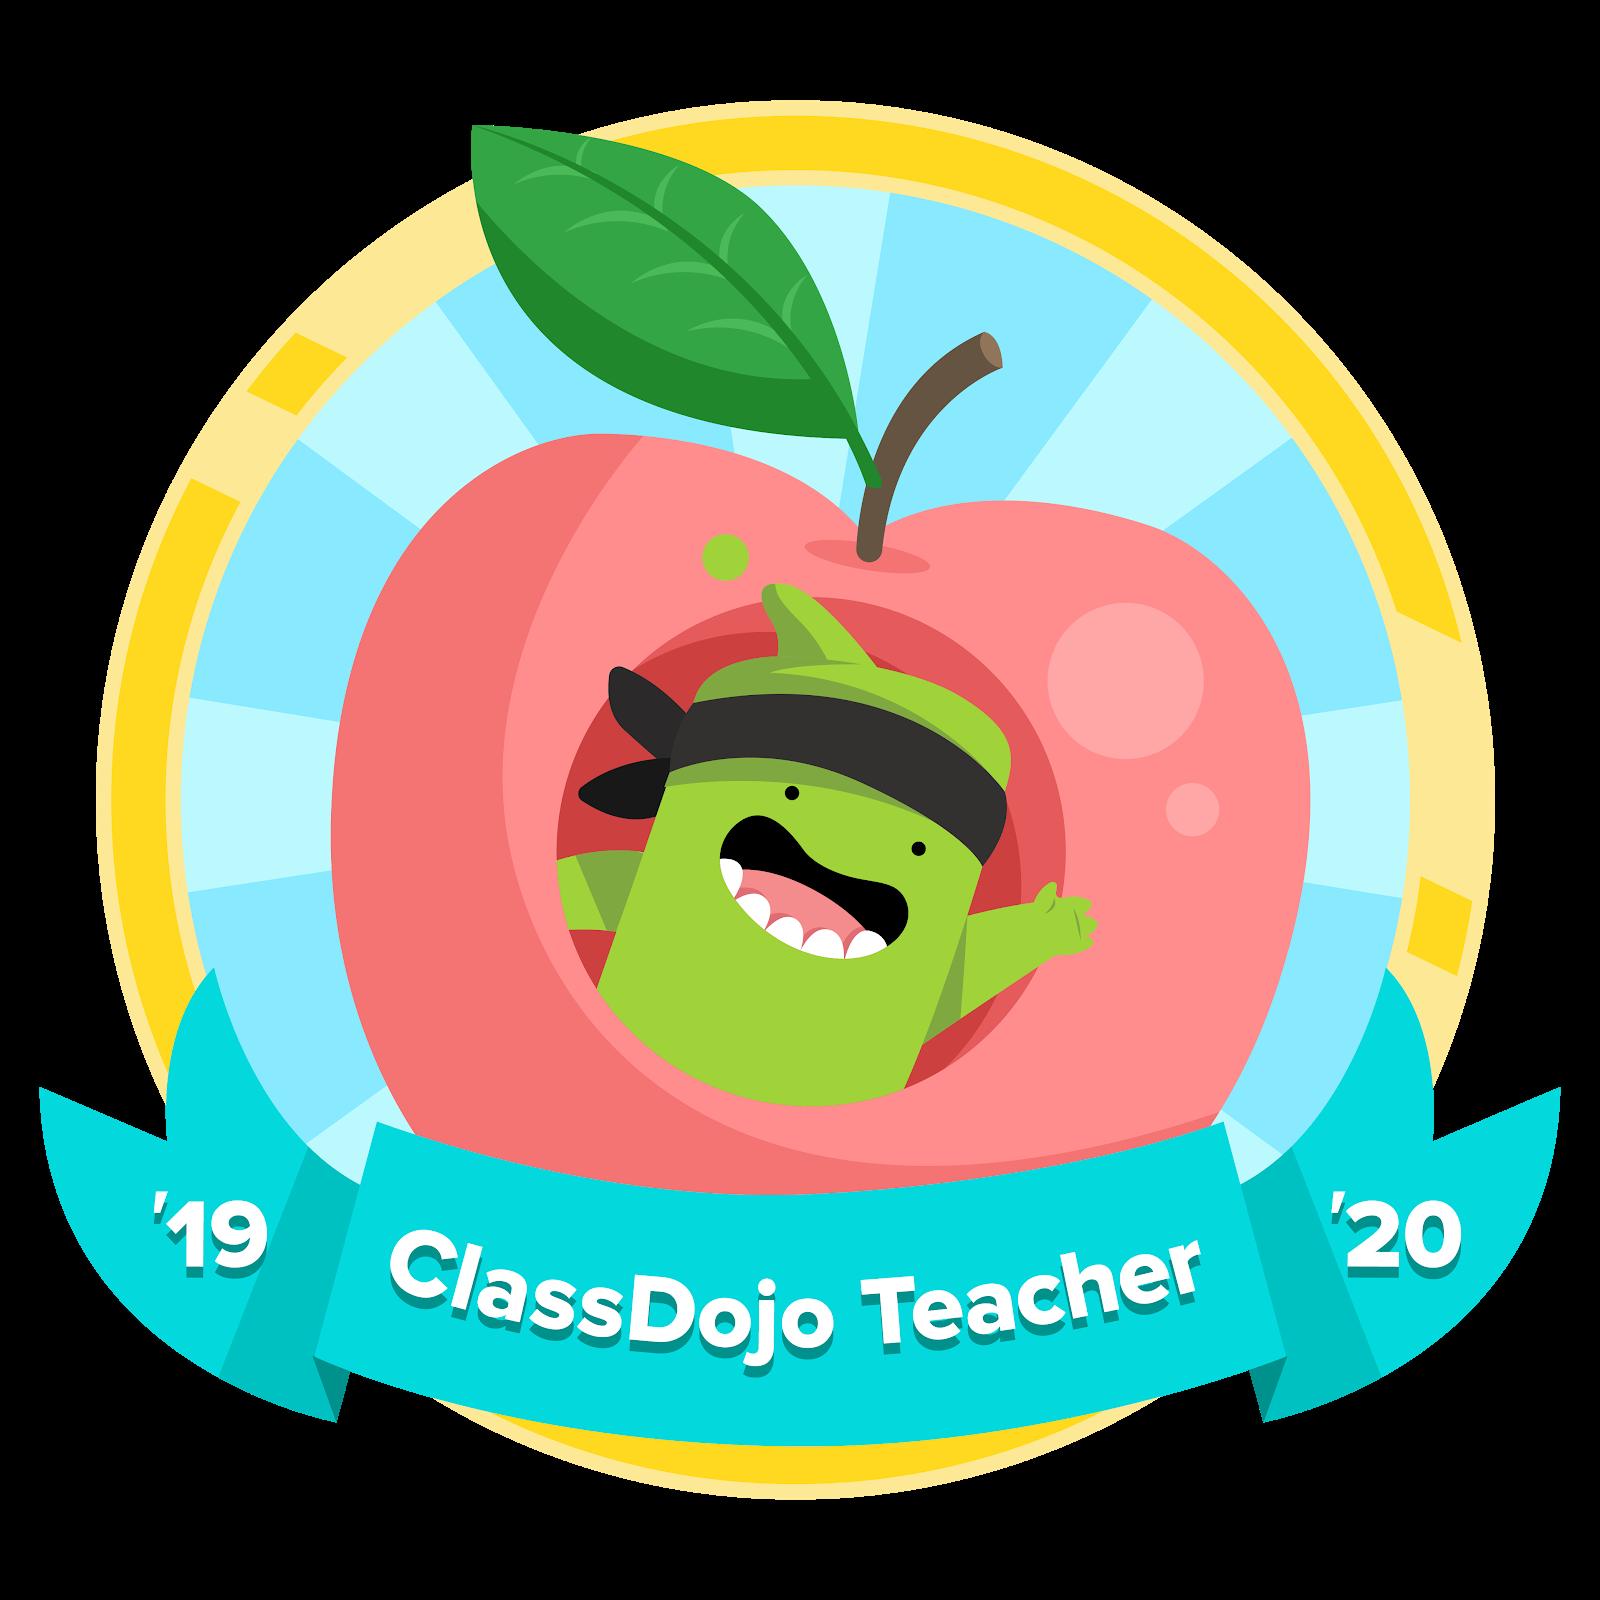 I'm a ClassDojo Teacher